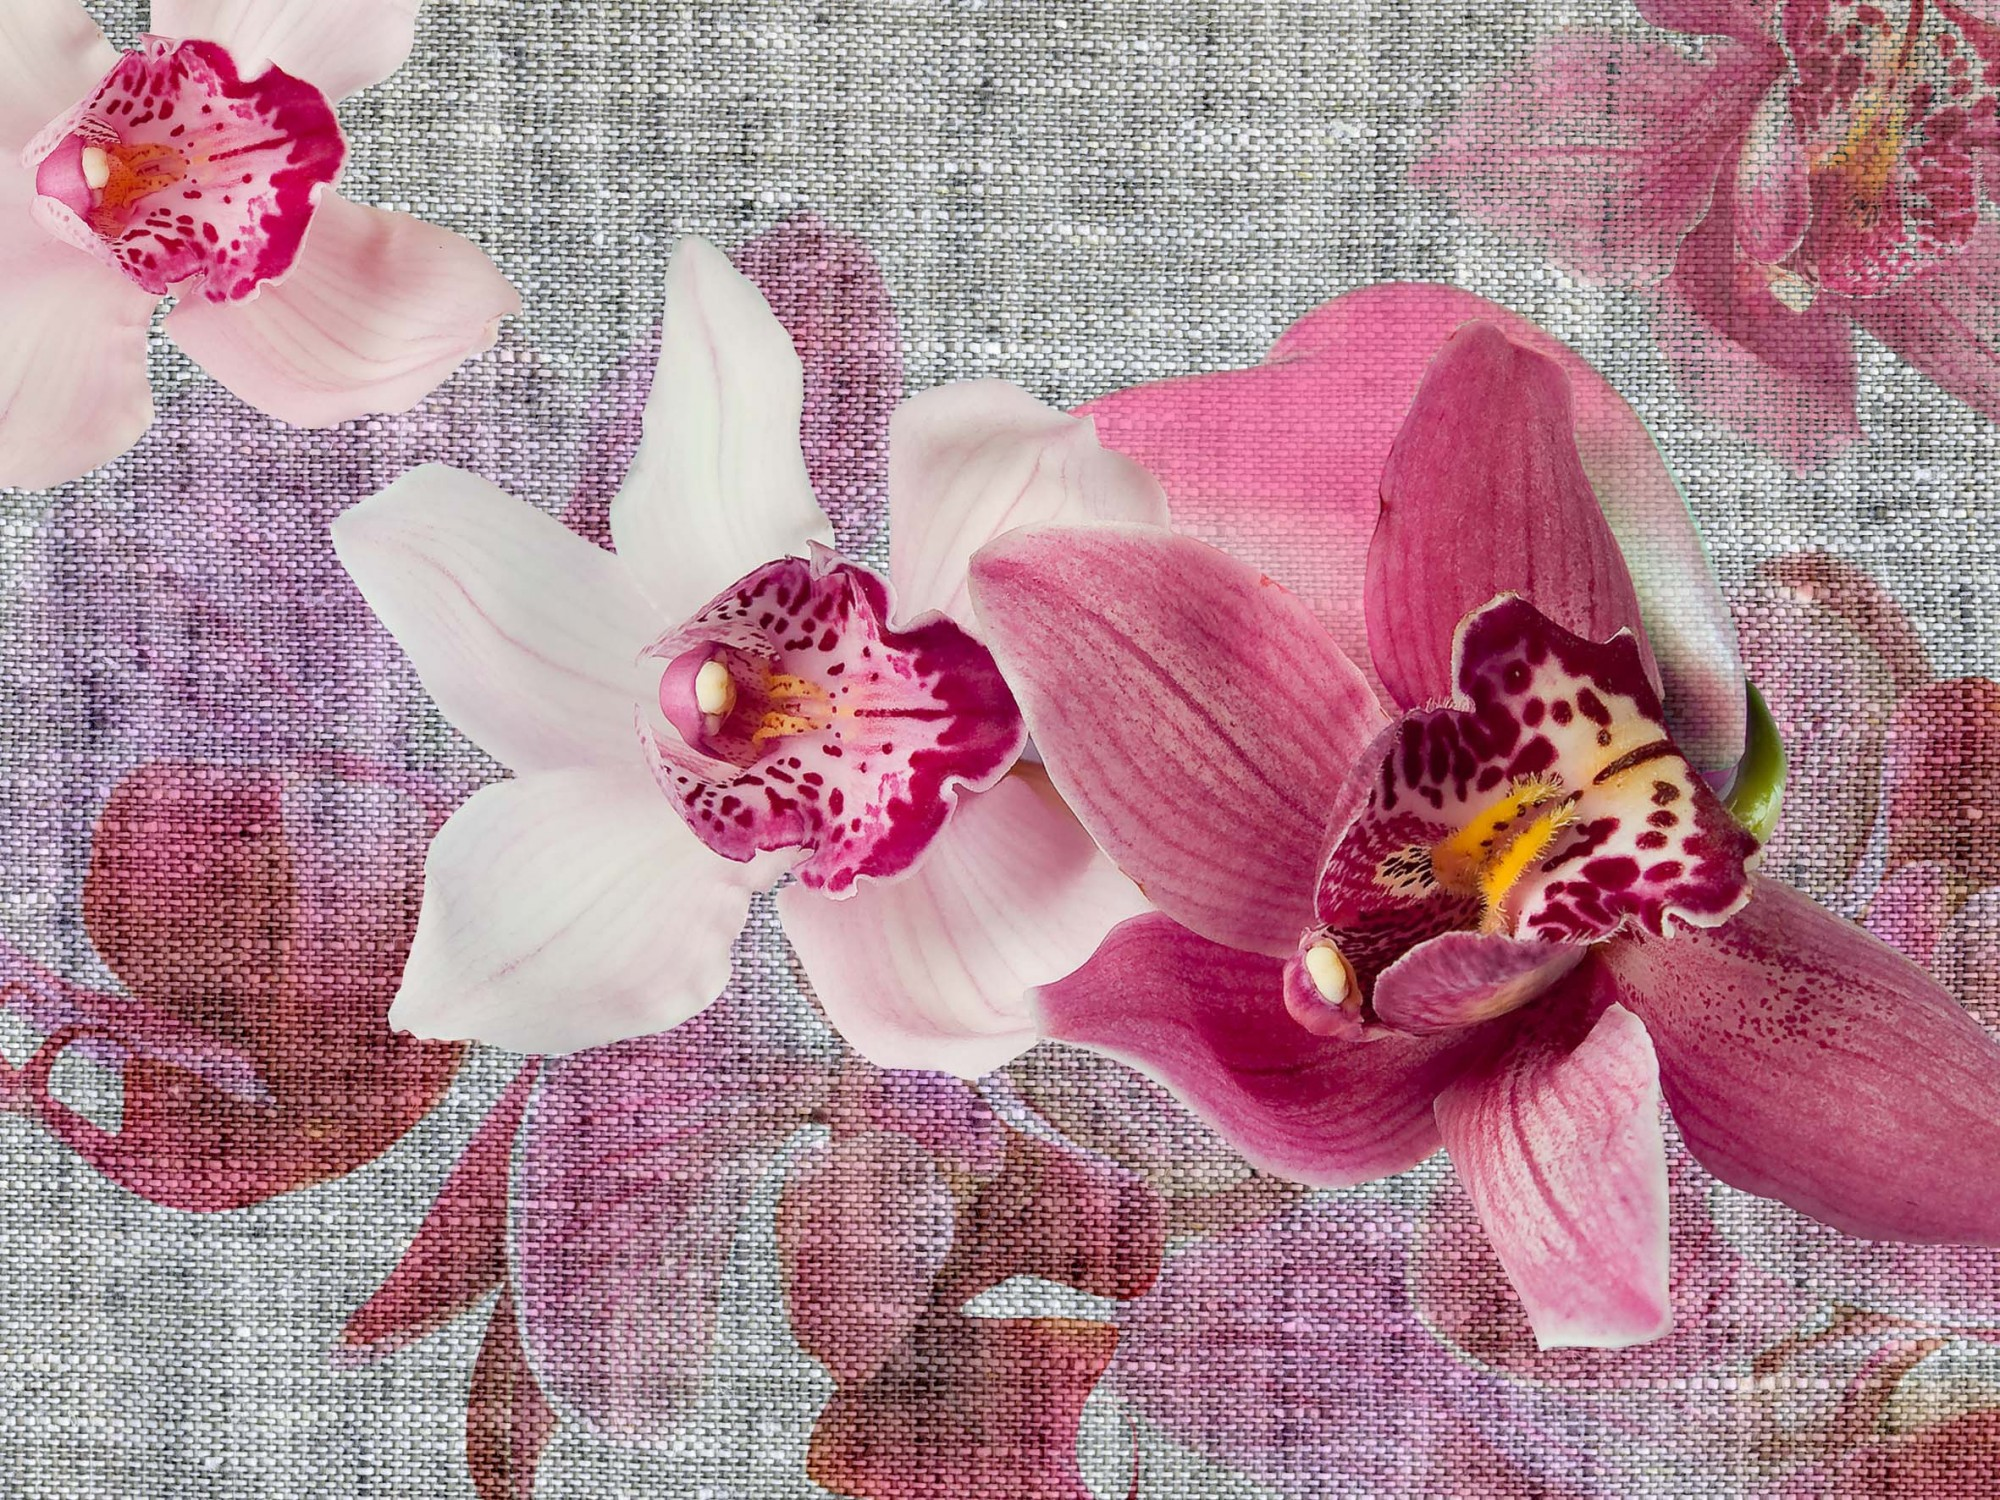 wandbild 360 x 270 cm 4 teilig kleister fototapete orchidee blumen bl ten. Black Bedroom Furniture Sets. Home Design Ideas